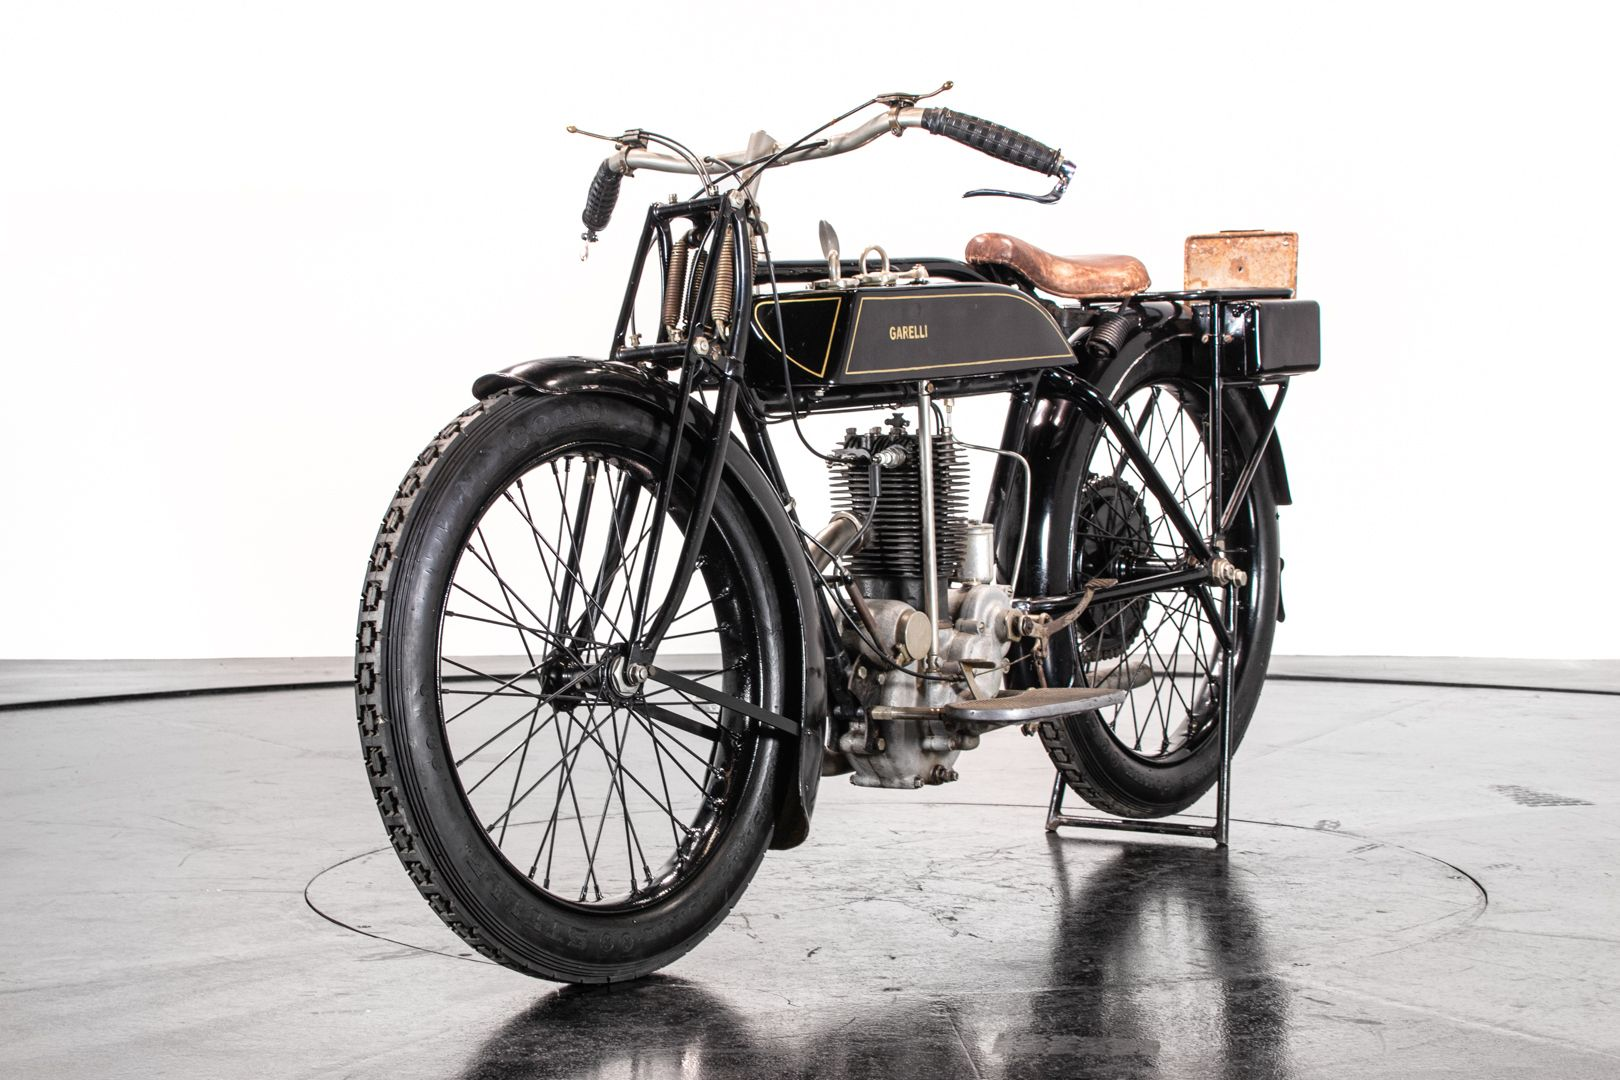 1924 Garelli M 107 63989